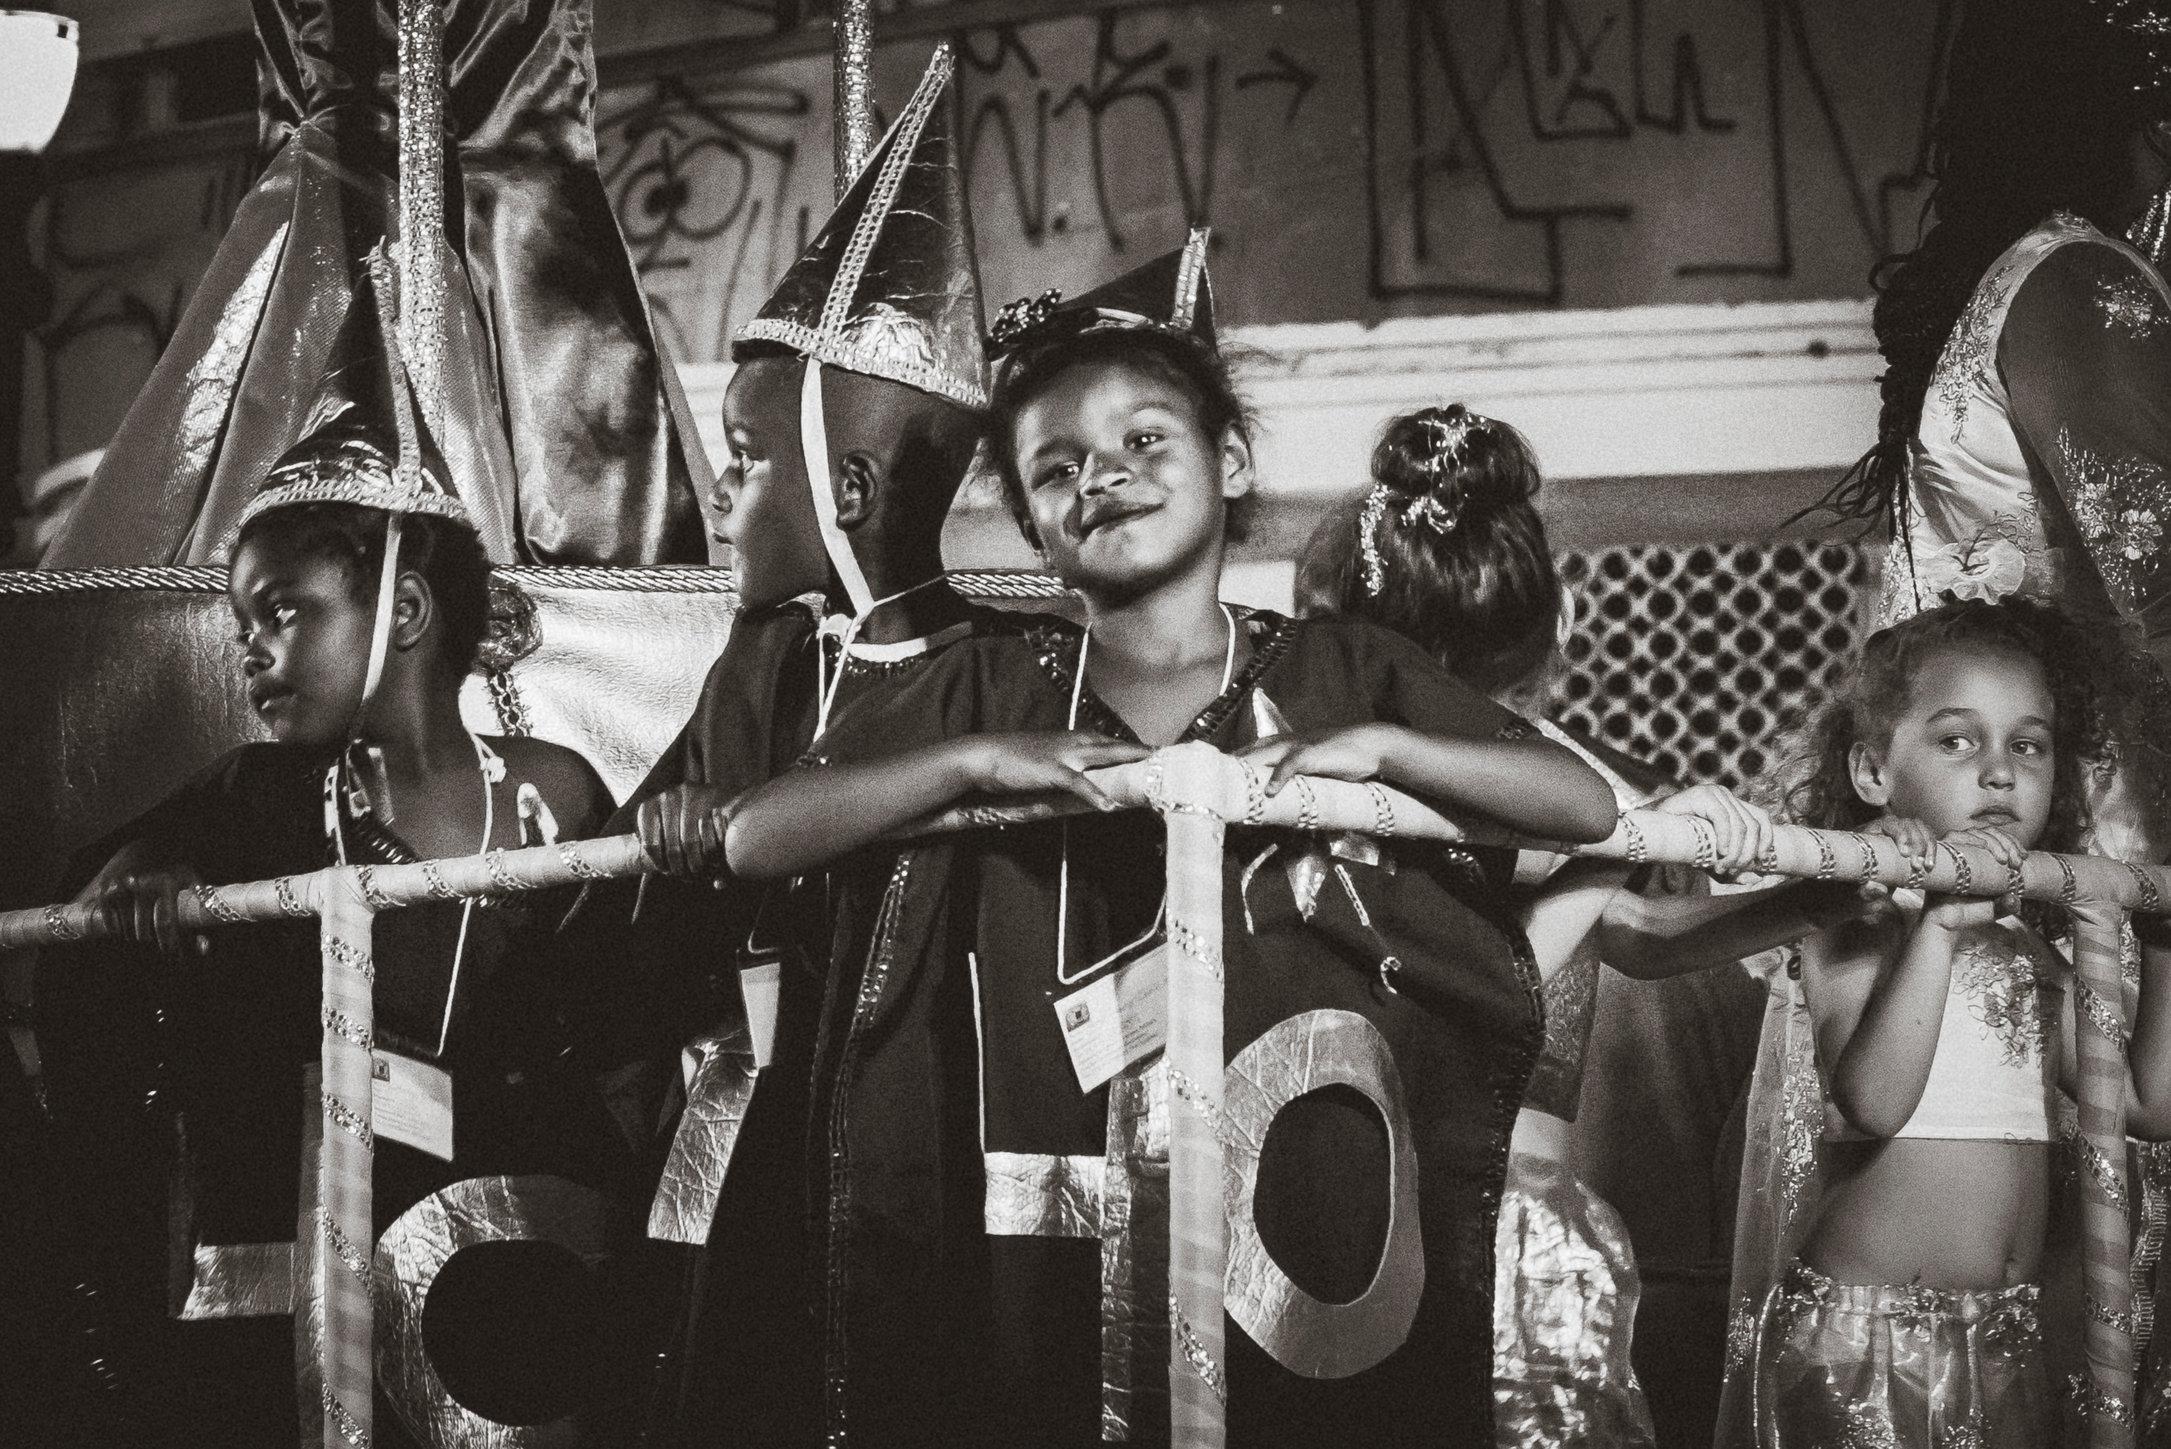 20180212-Carnaval-2.jpg